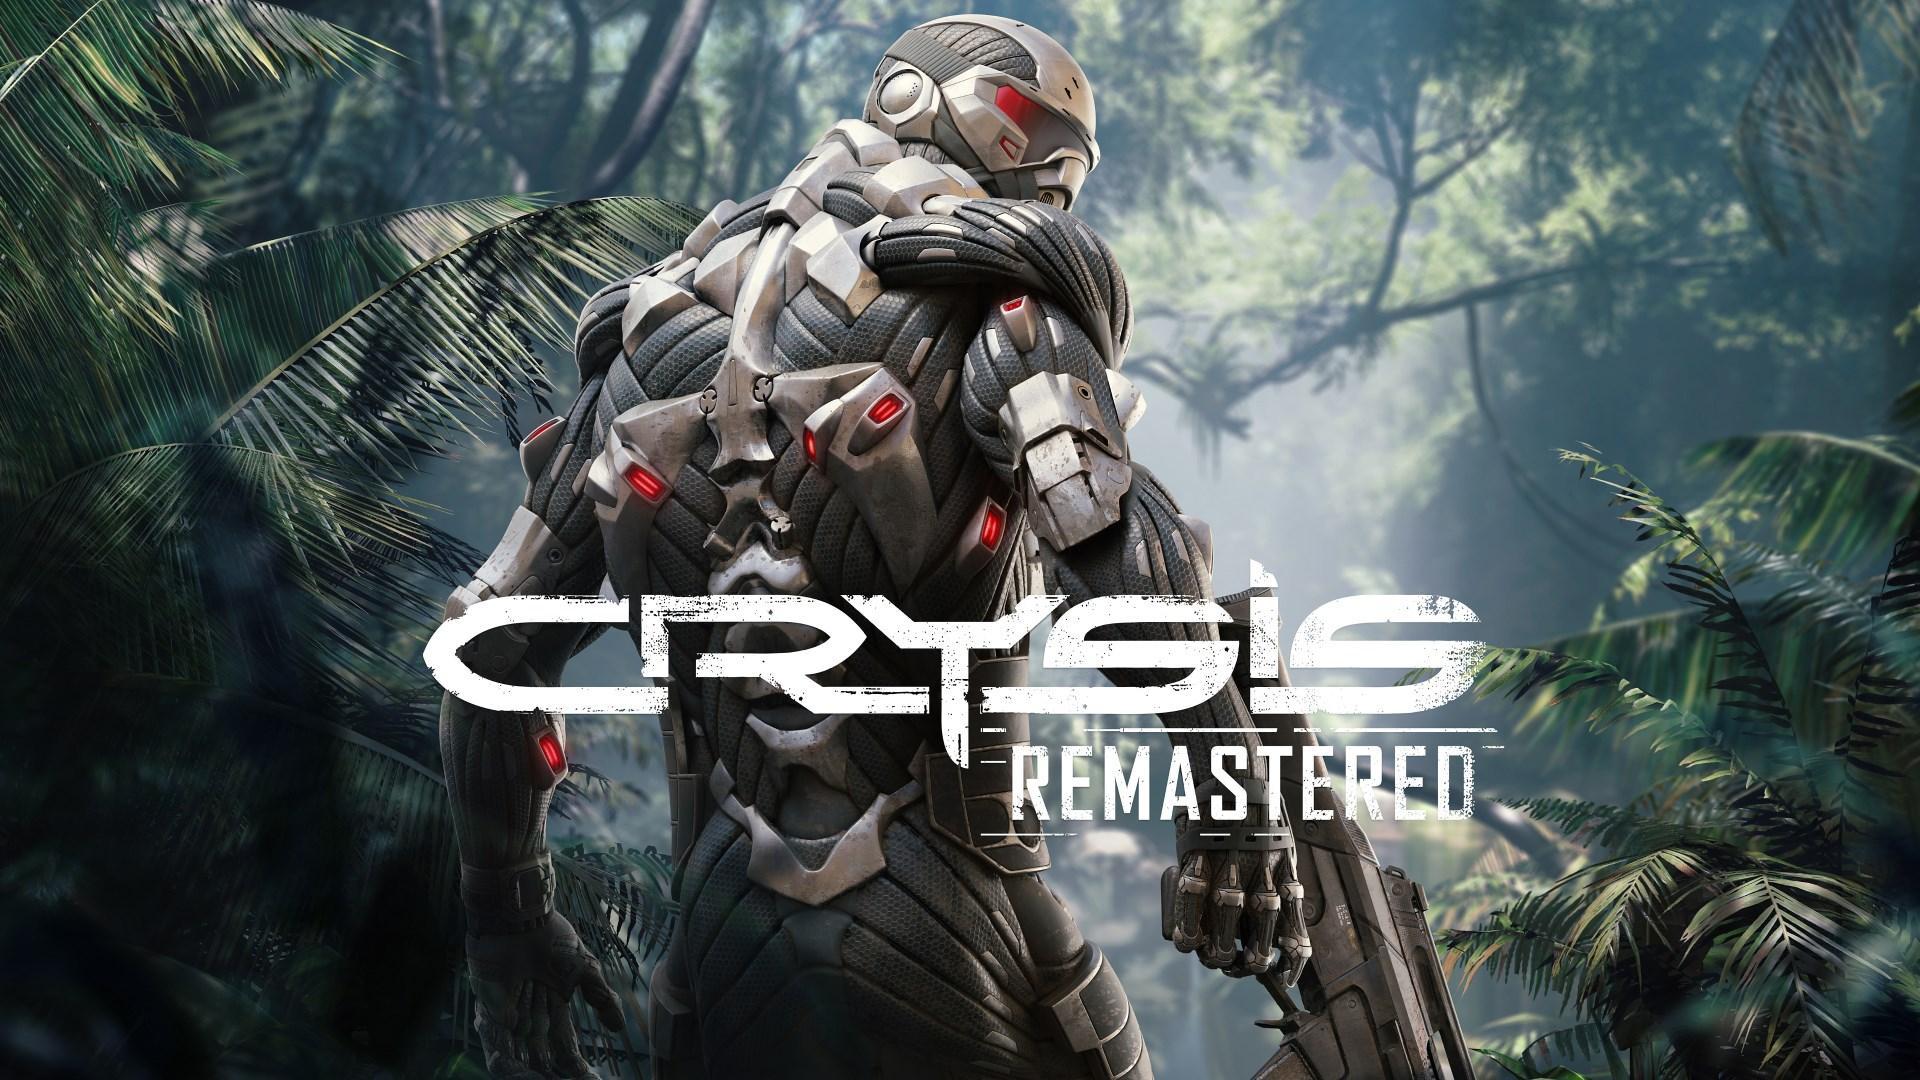 Геймплей и частота кадров Crysis Remastered 2